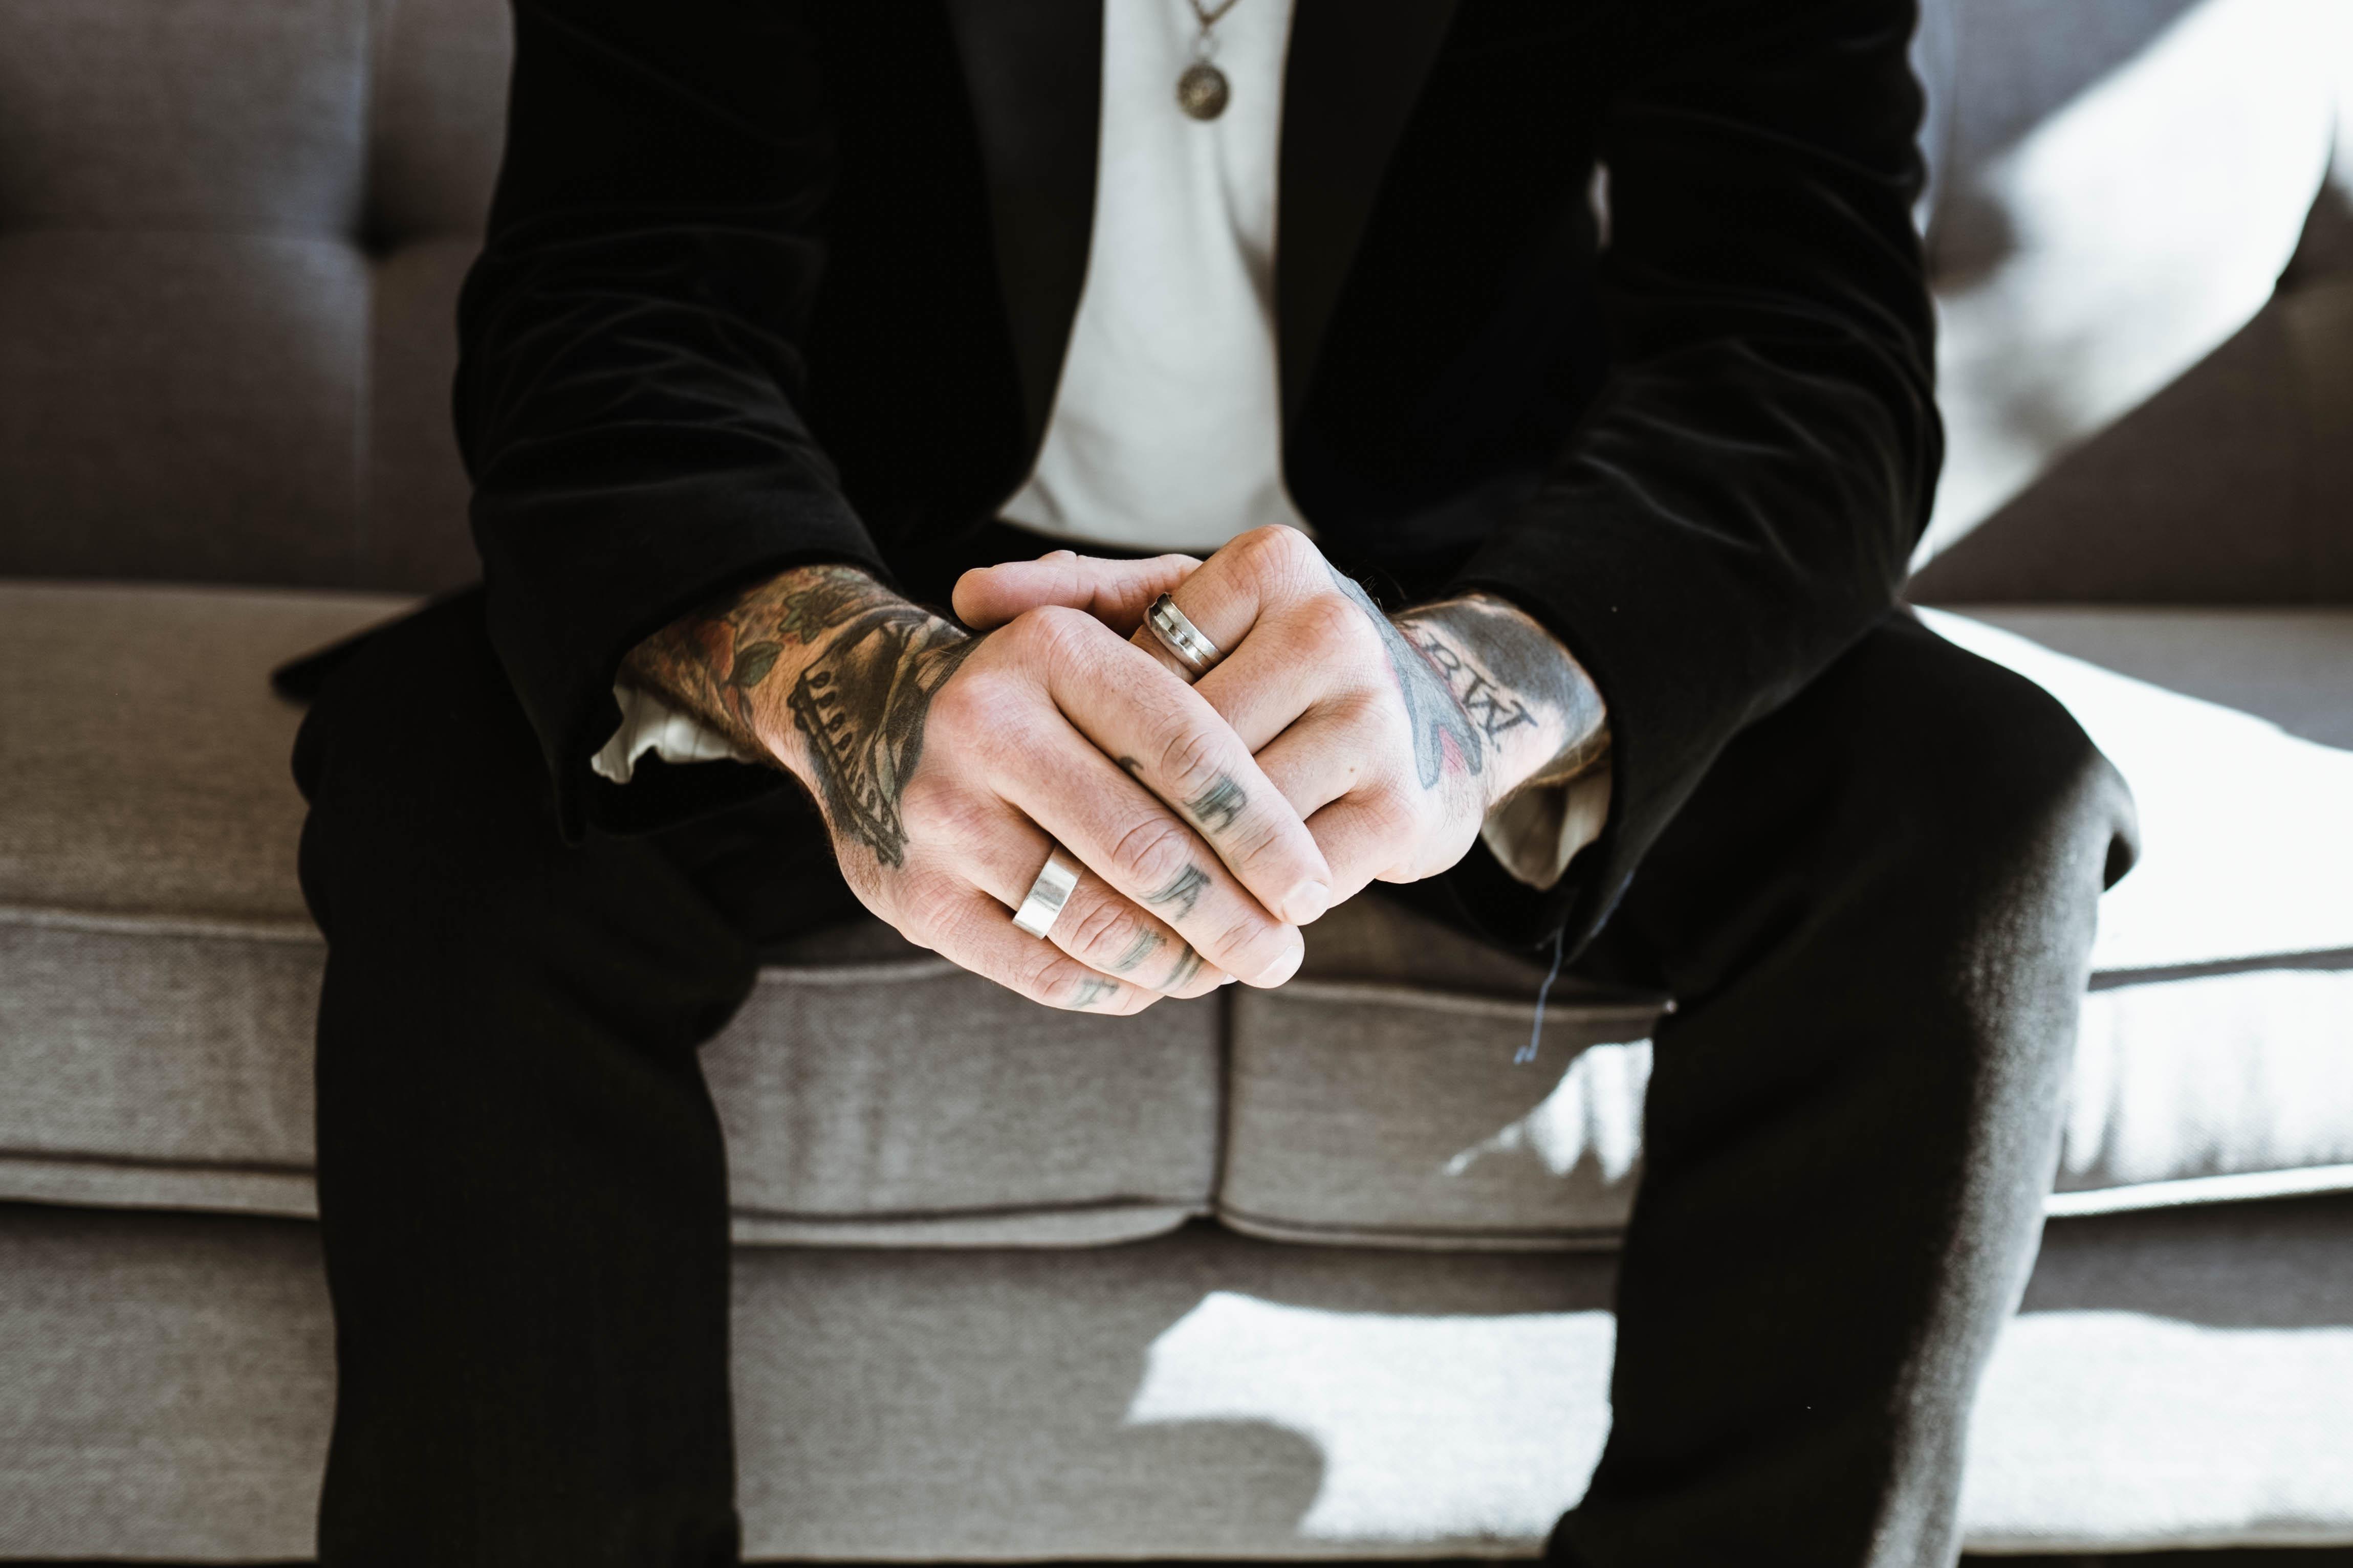 Fotos Gratis Mano Hombre Traje Masculino Dedo Tatuaje